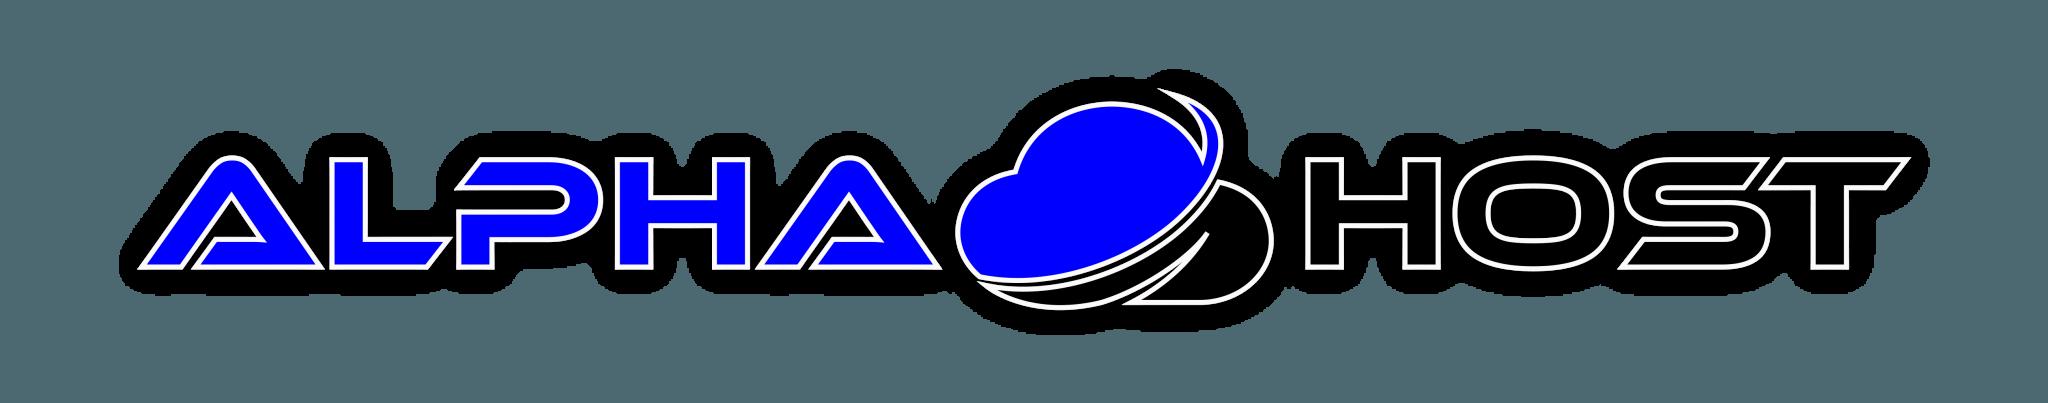 hosting-alpha-host